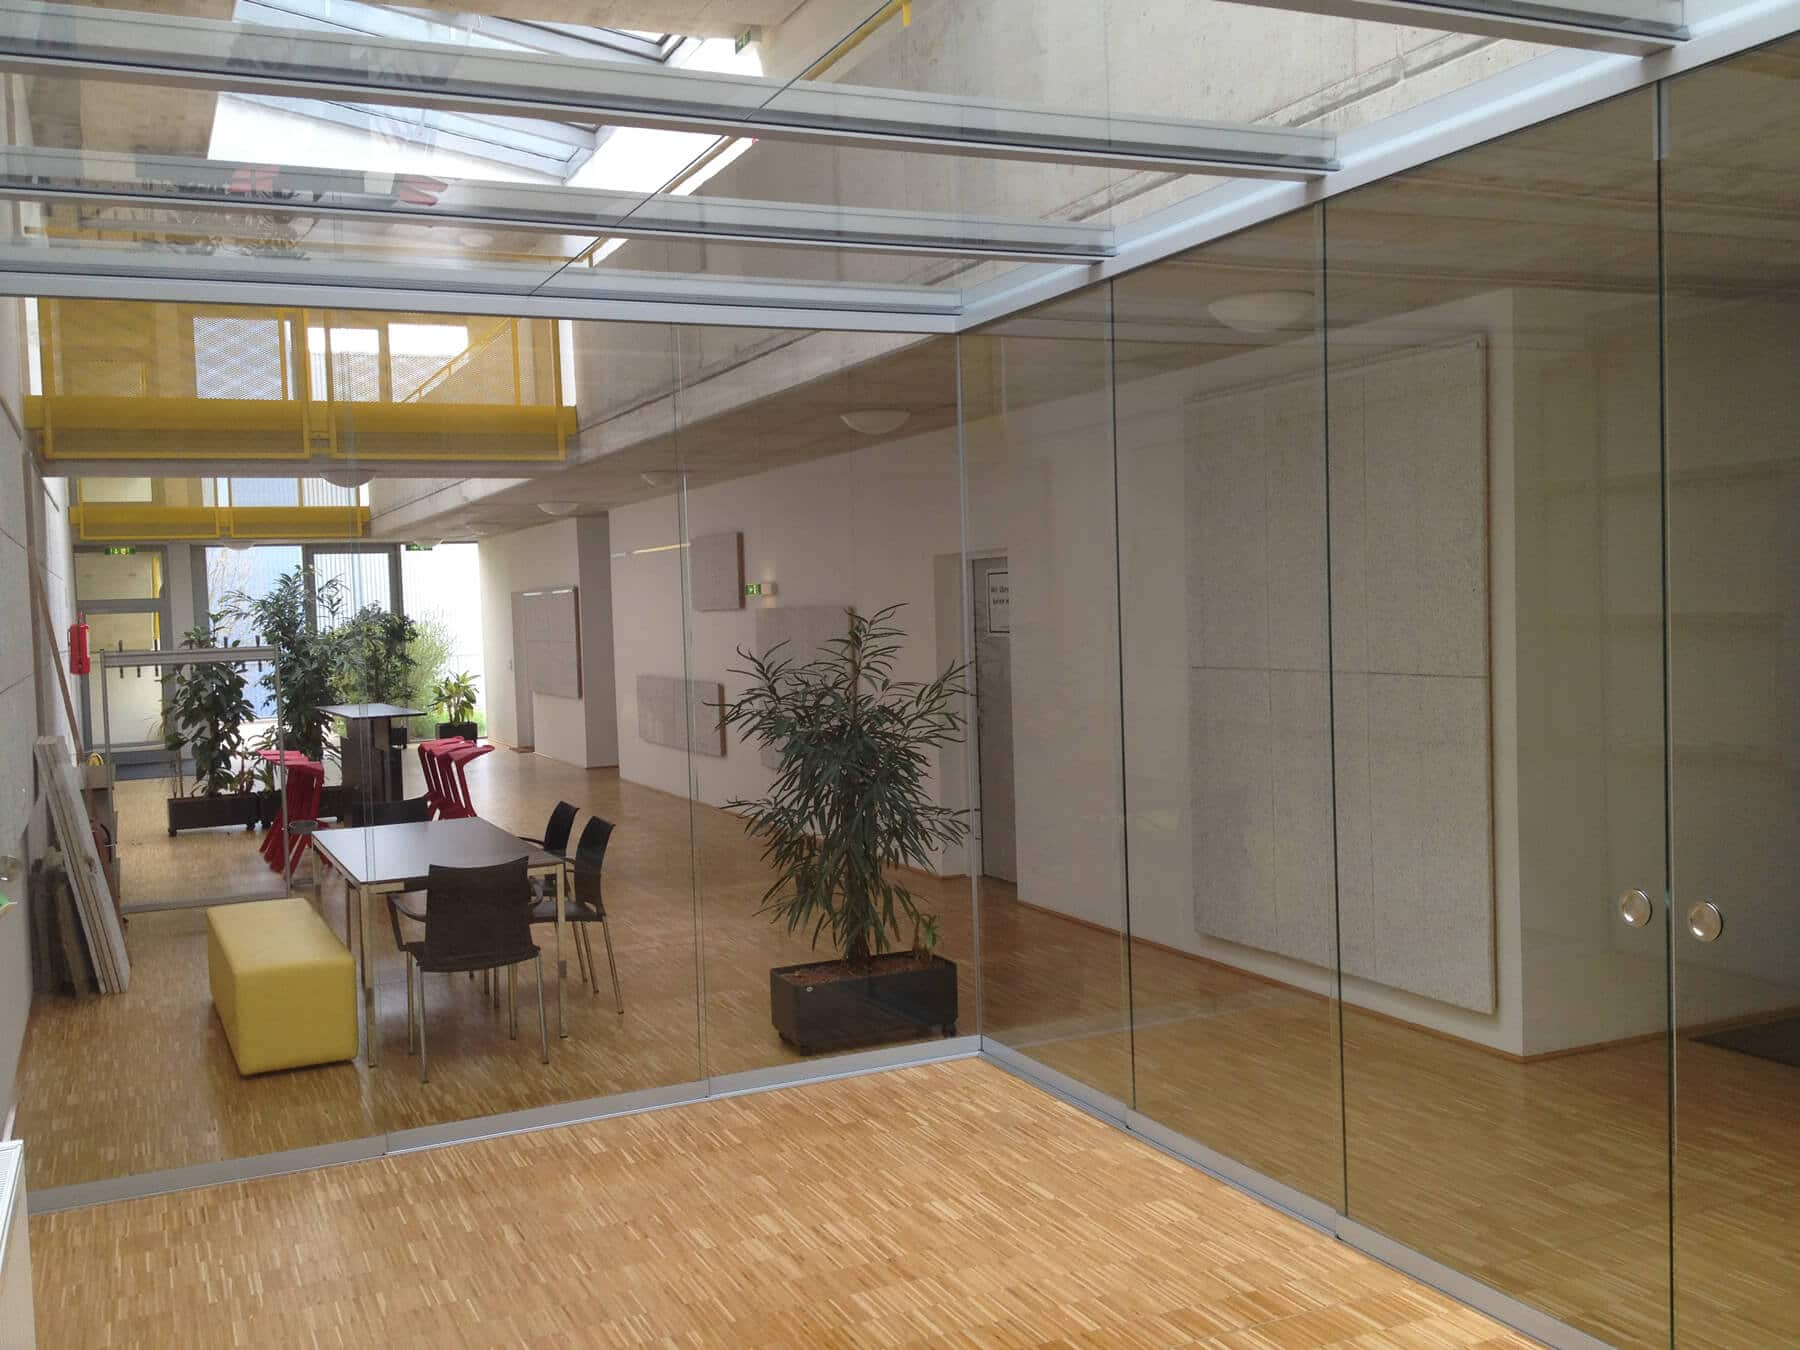 wintergarten aus holz glas fenster schmidinger. Black Bedroom Furniture Sets. Home Design Ideas